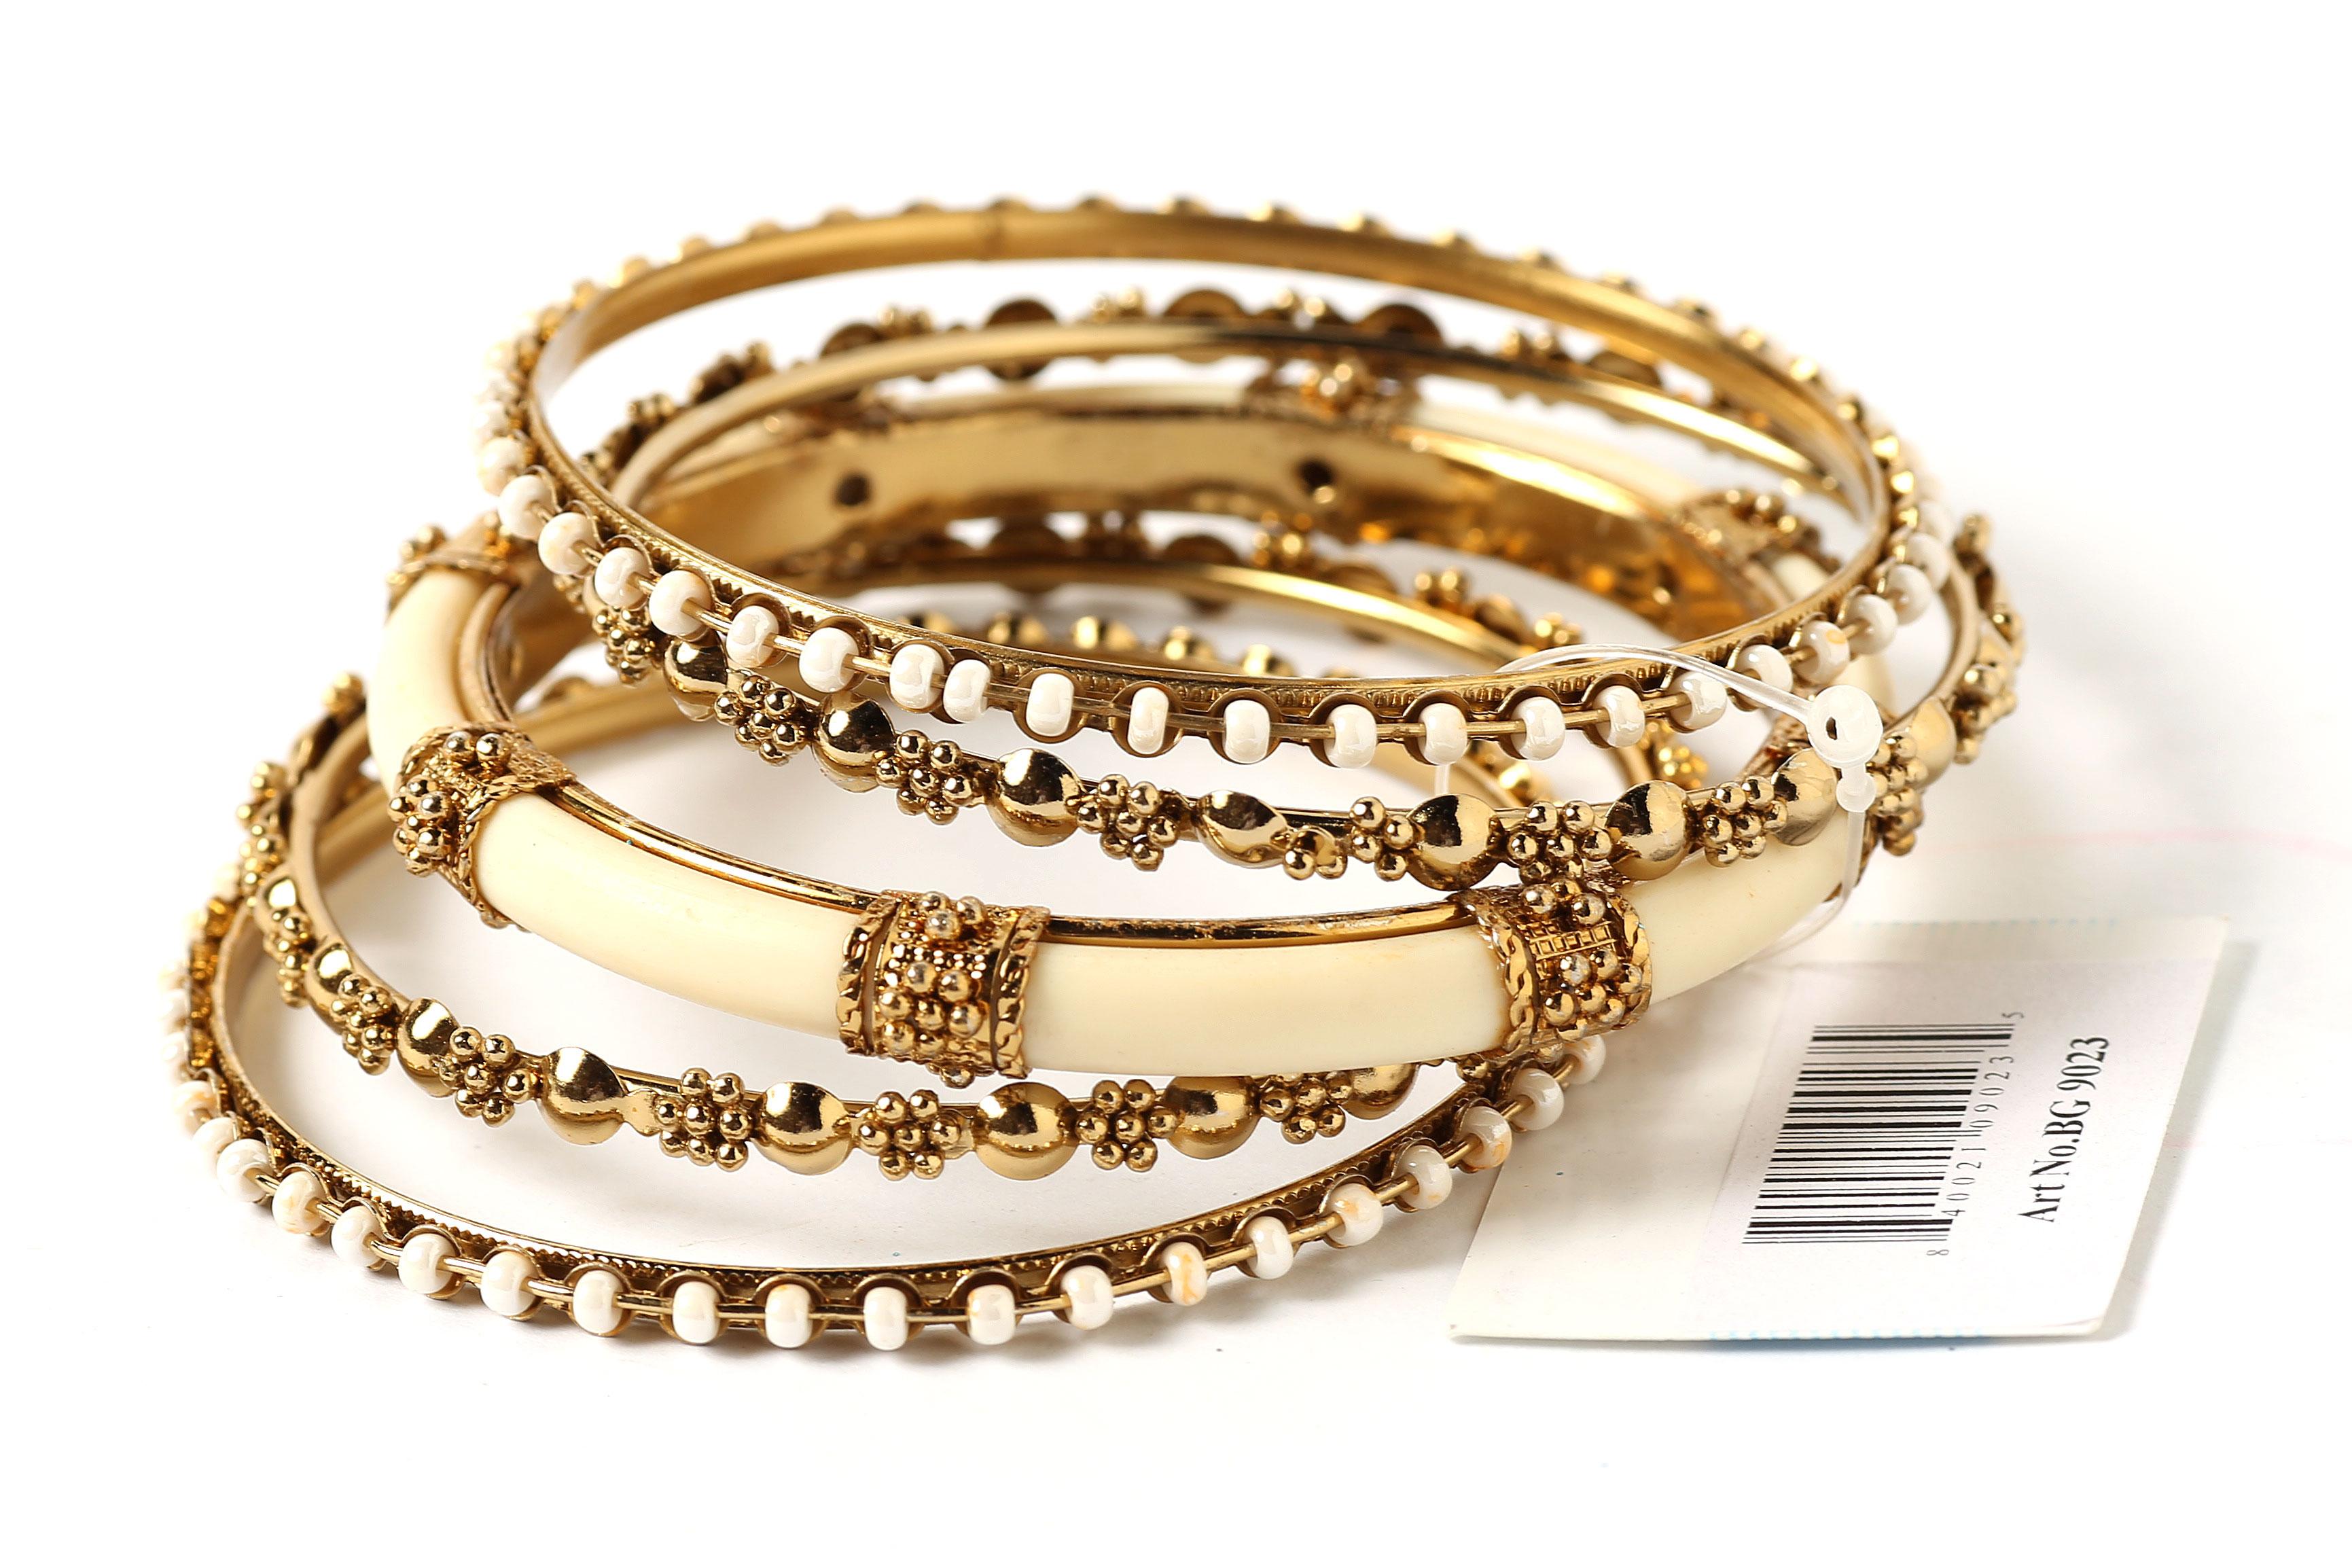 Wholesale Handbags #pob-03900 Gold and Ivory metal with Resin bangle